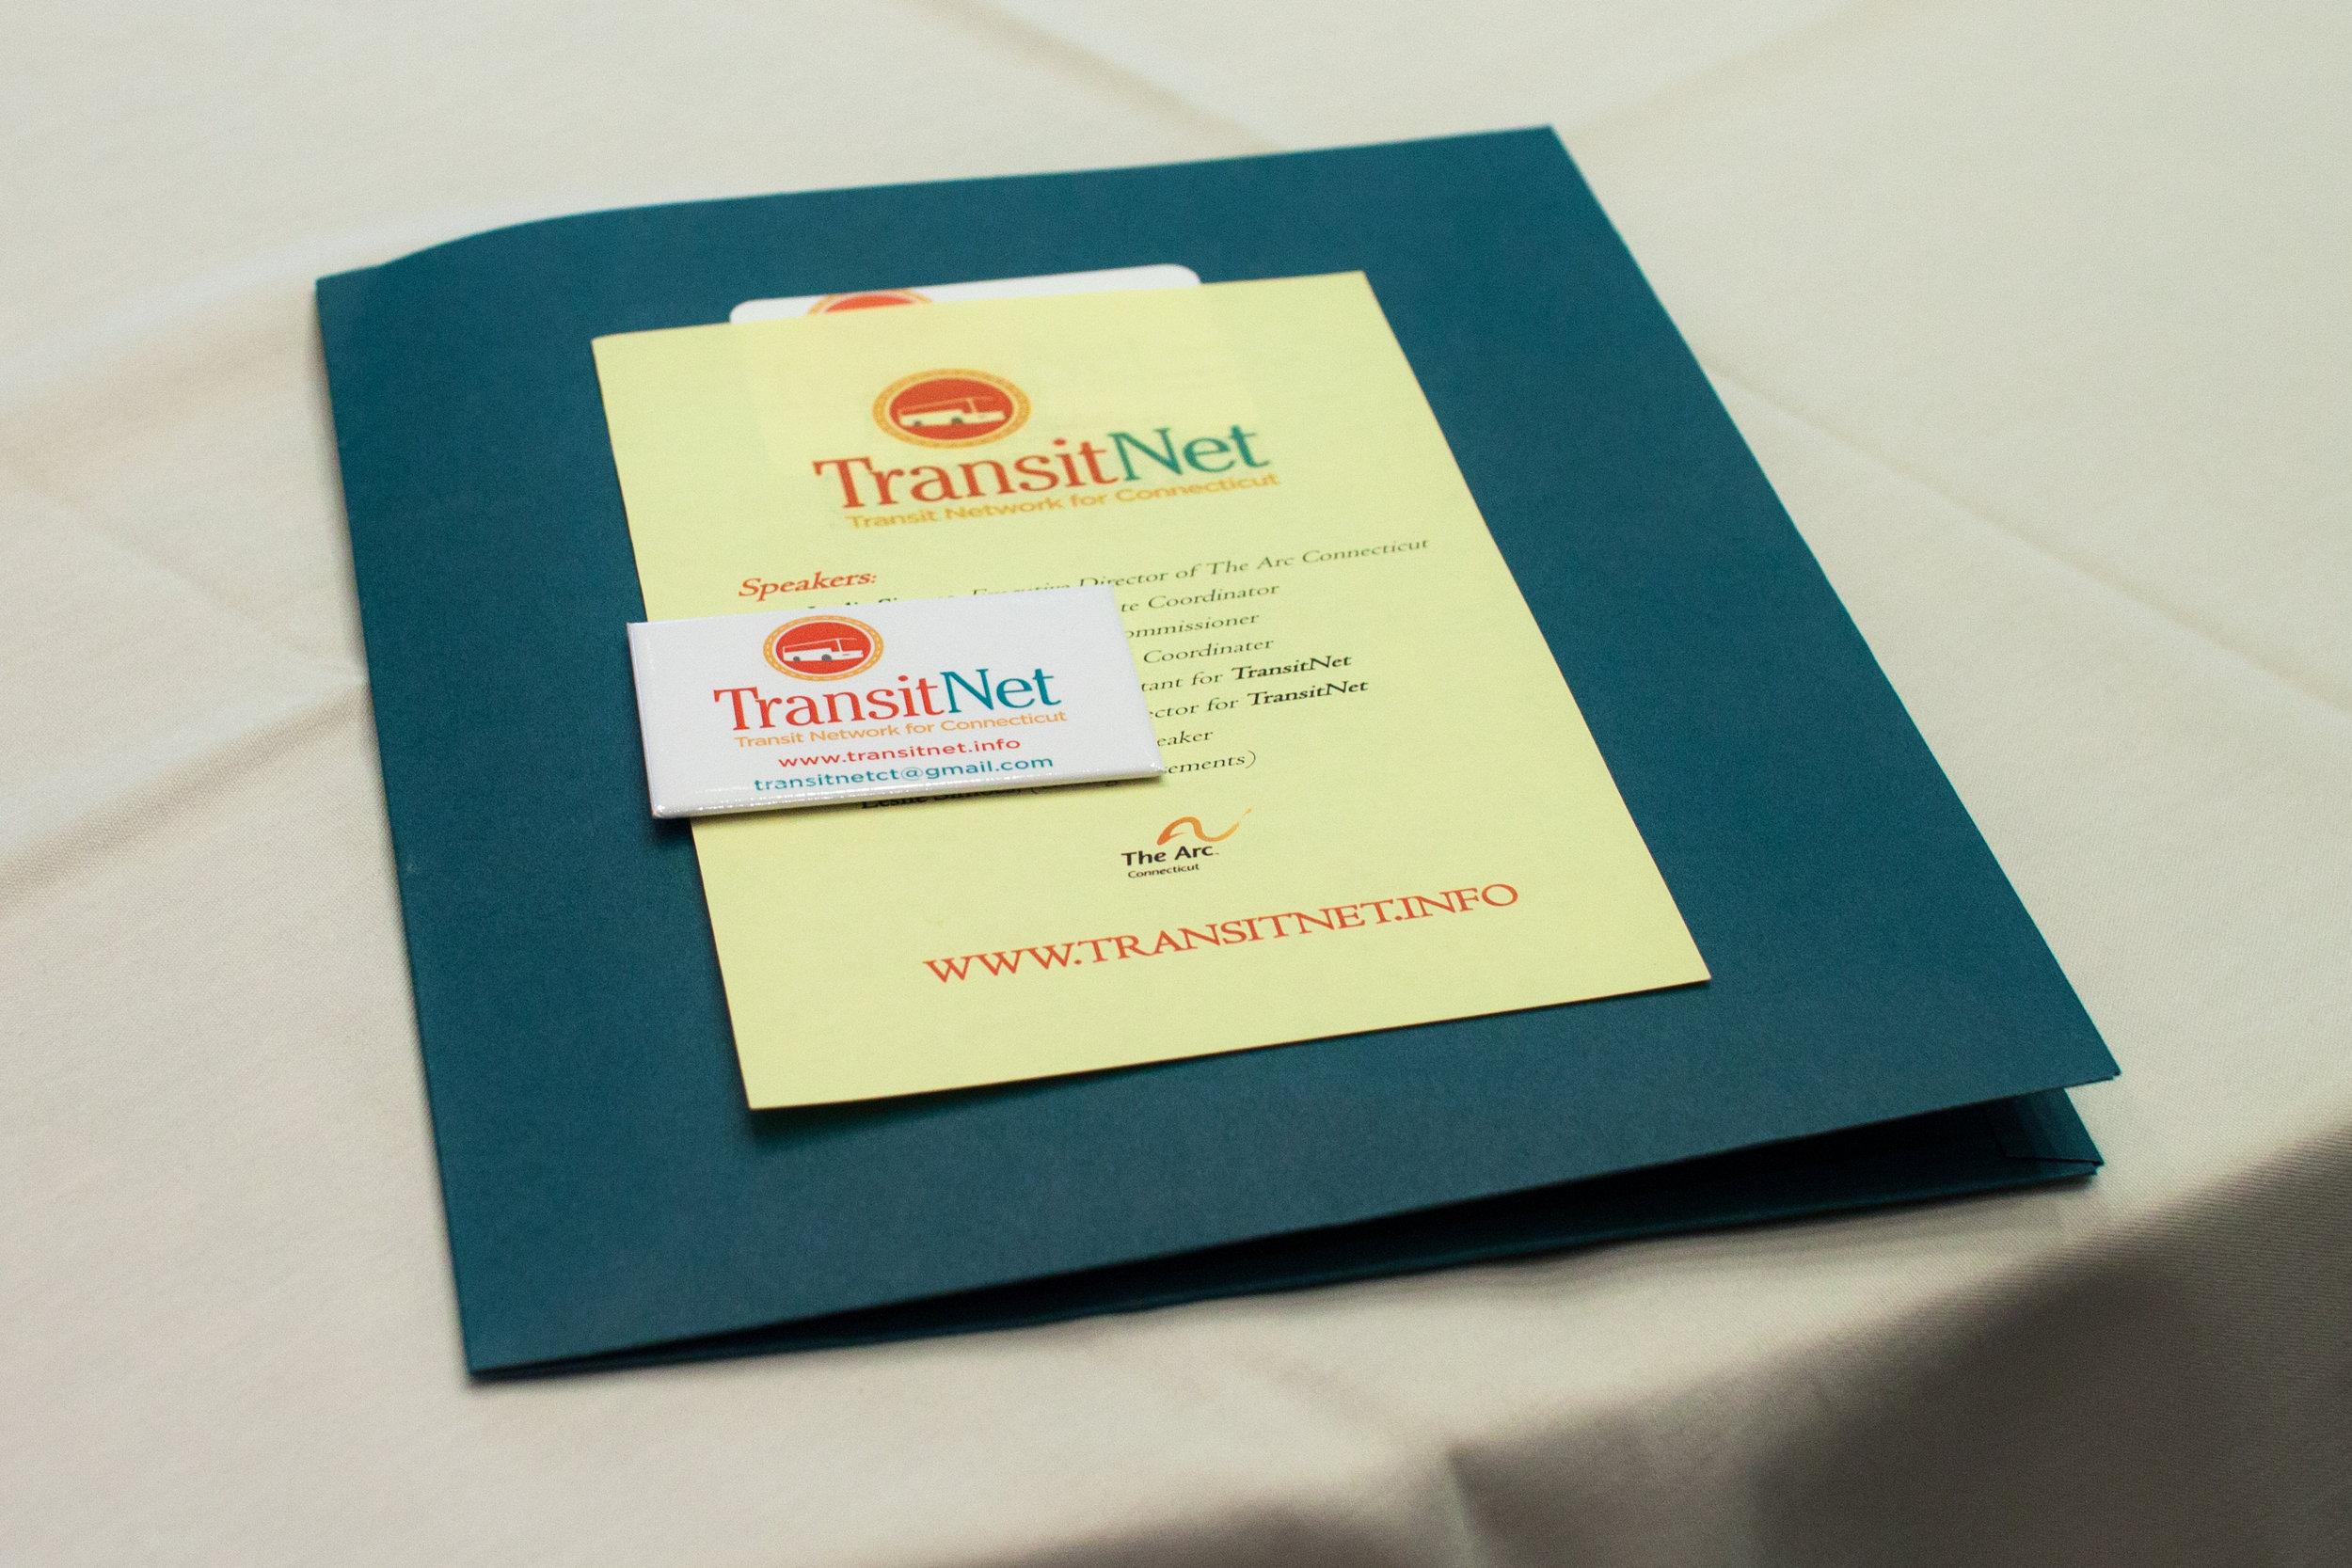 10.22.14 Arc TransitNet Website Launch-1.JPG